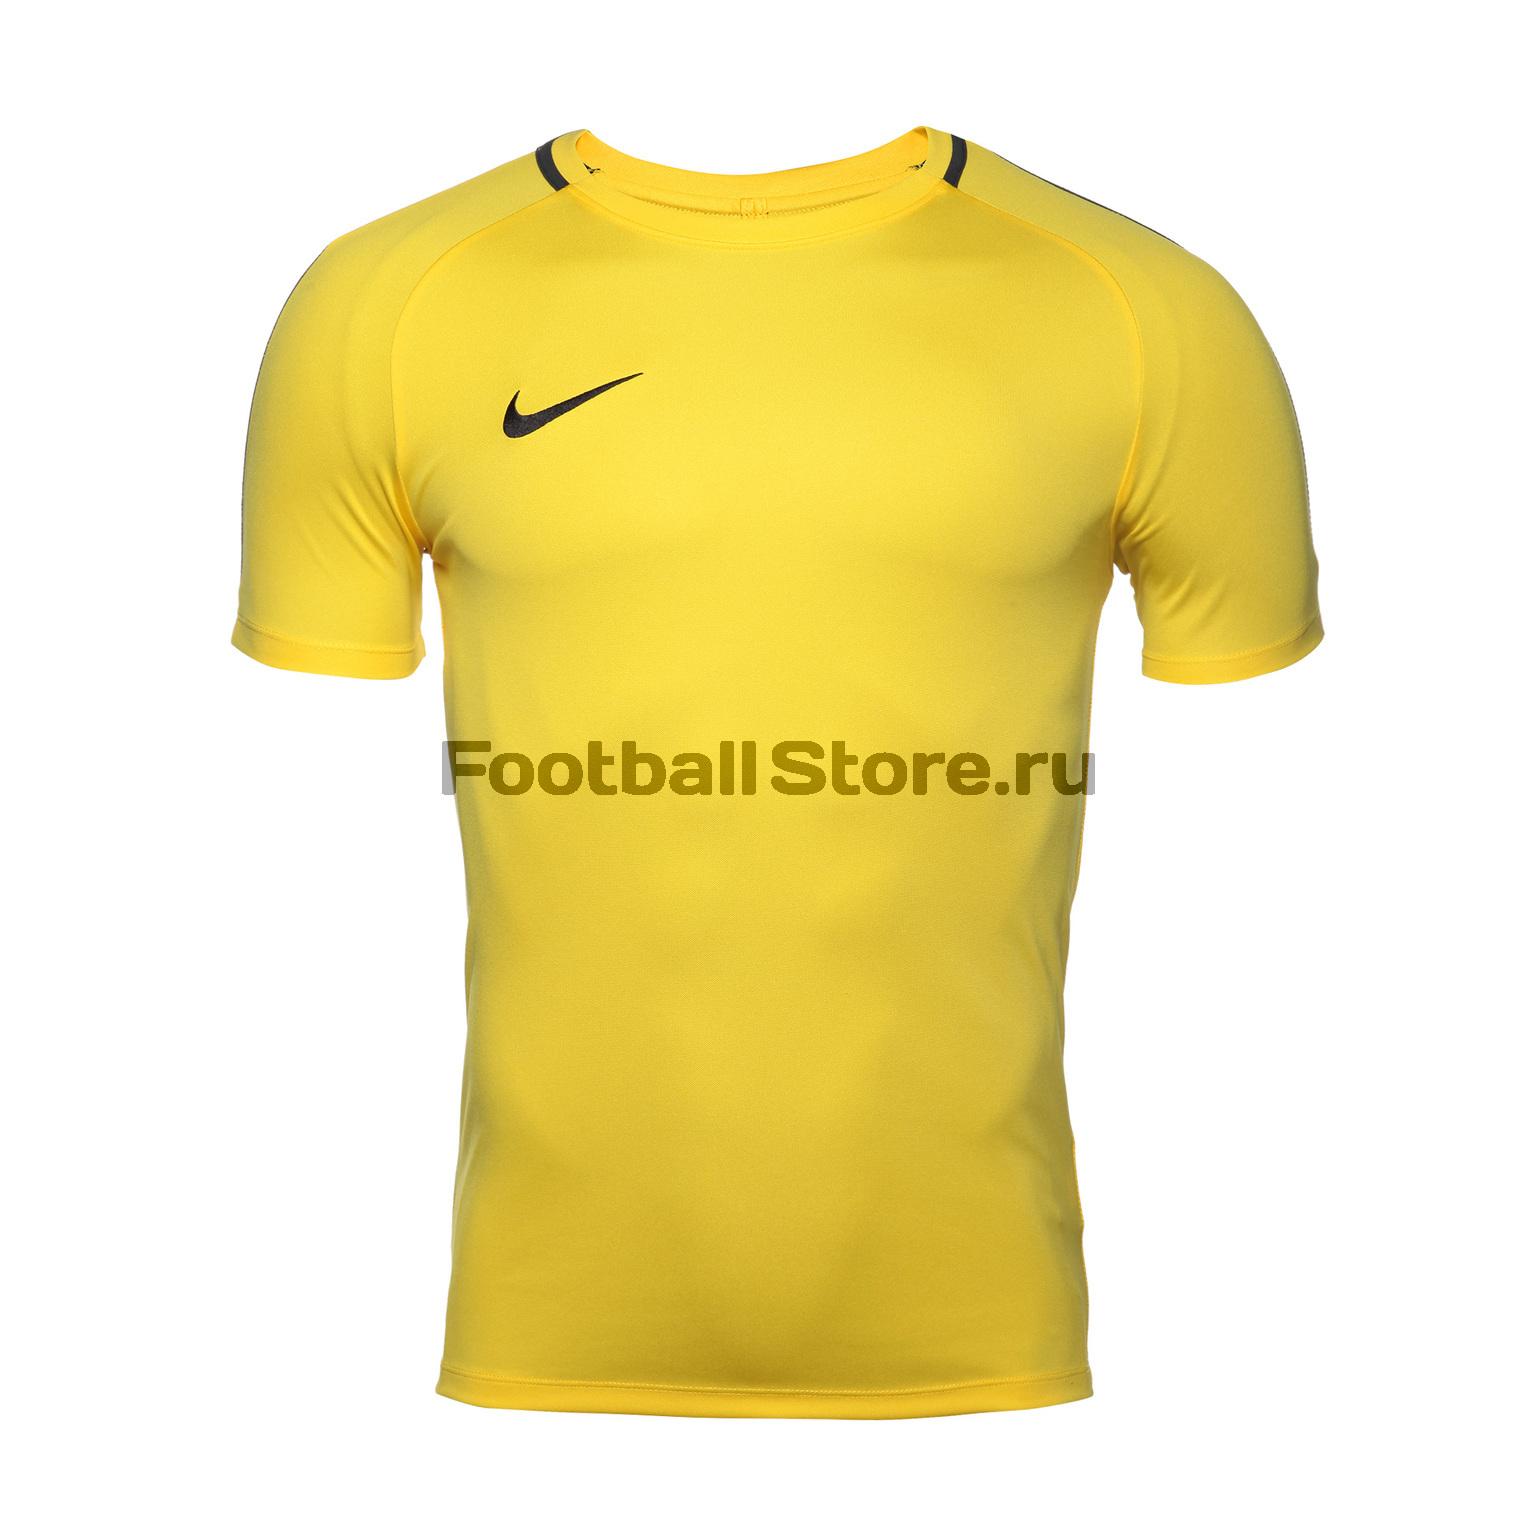 Футболка тренировочная Nike Dry Academy 18 893693-719